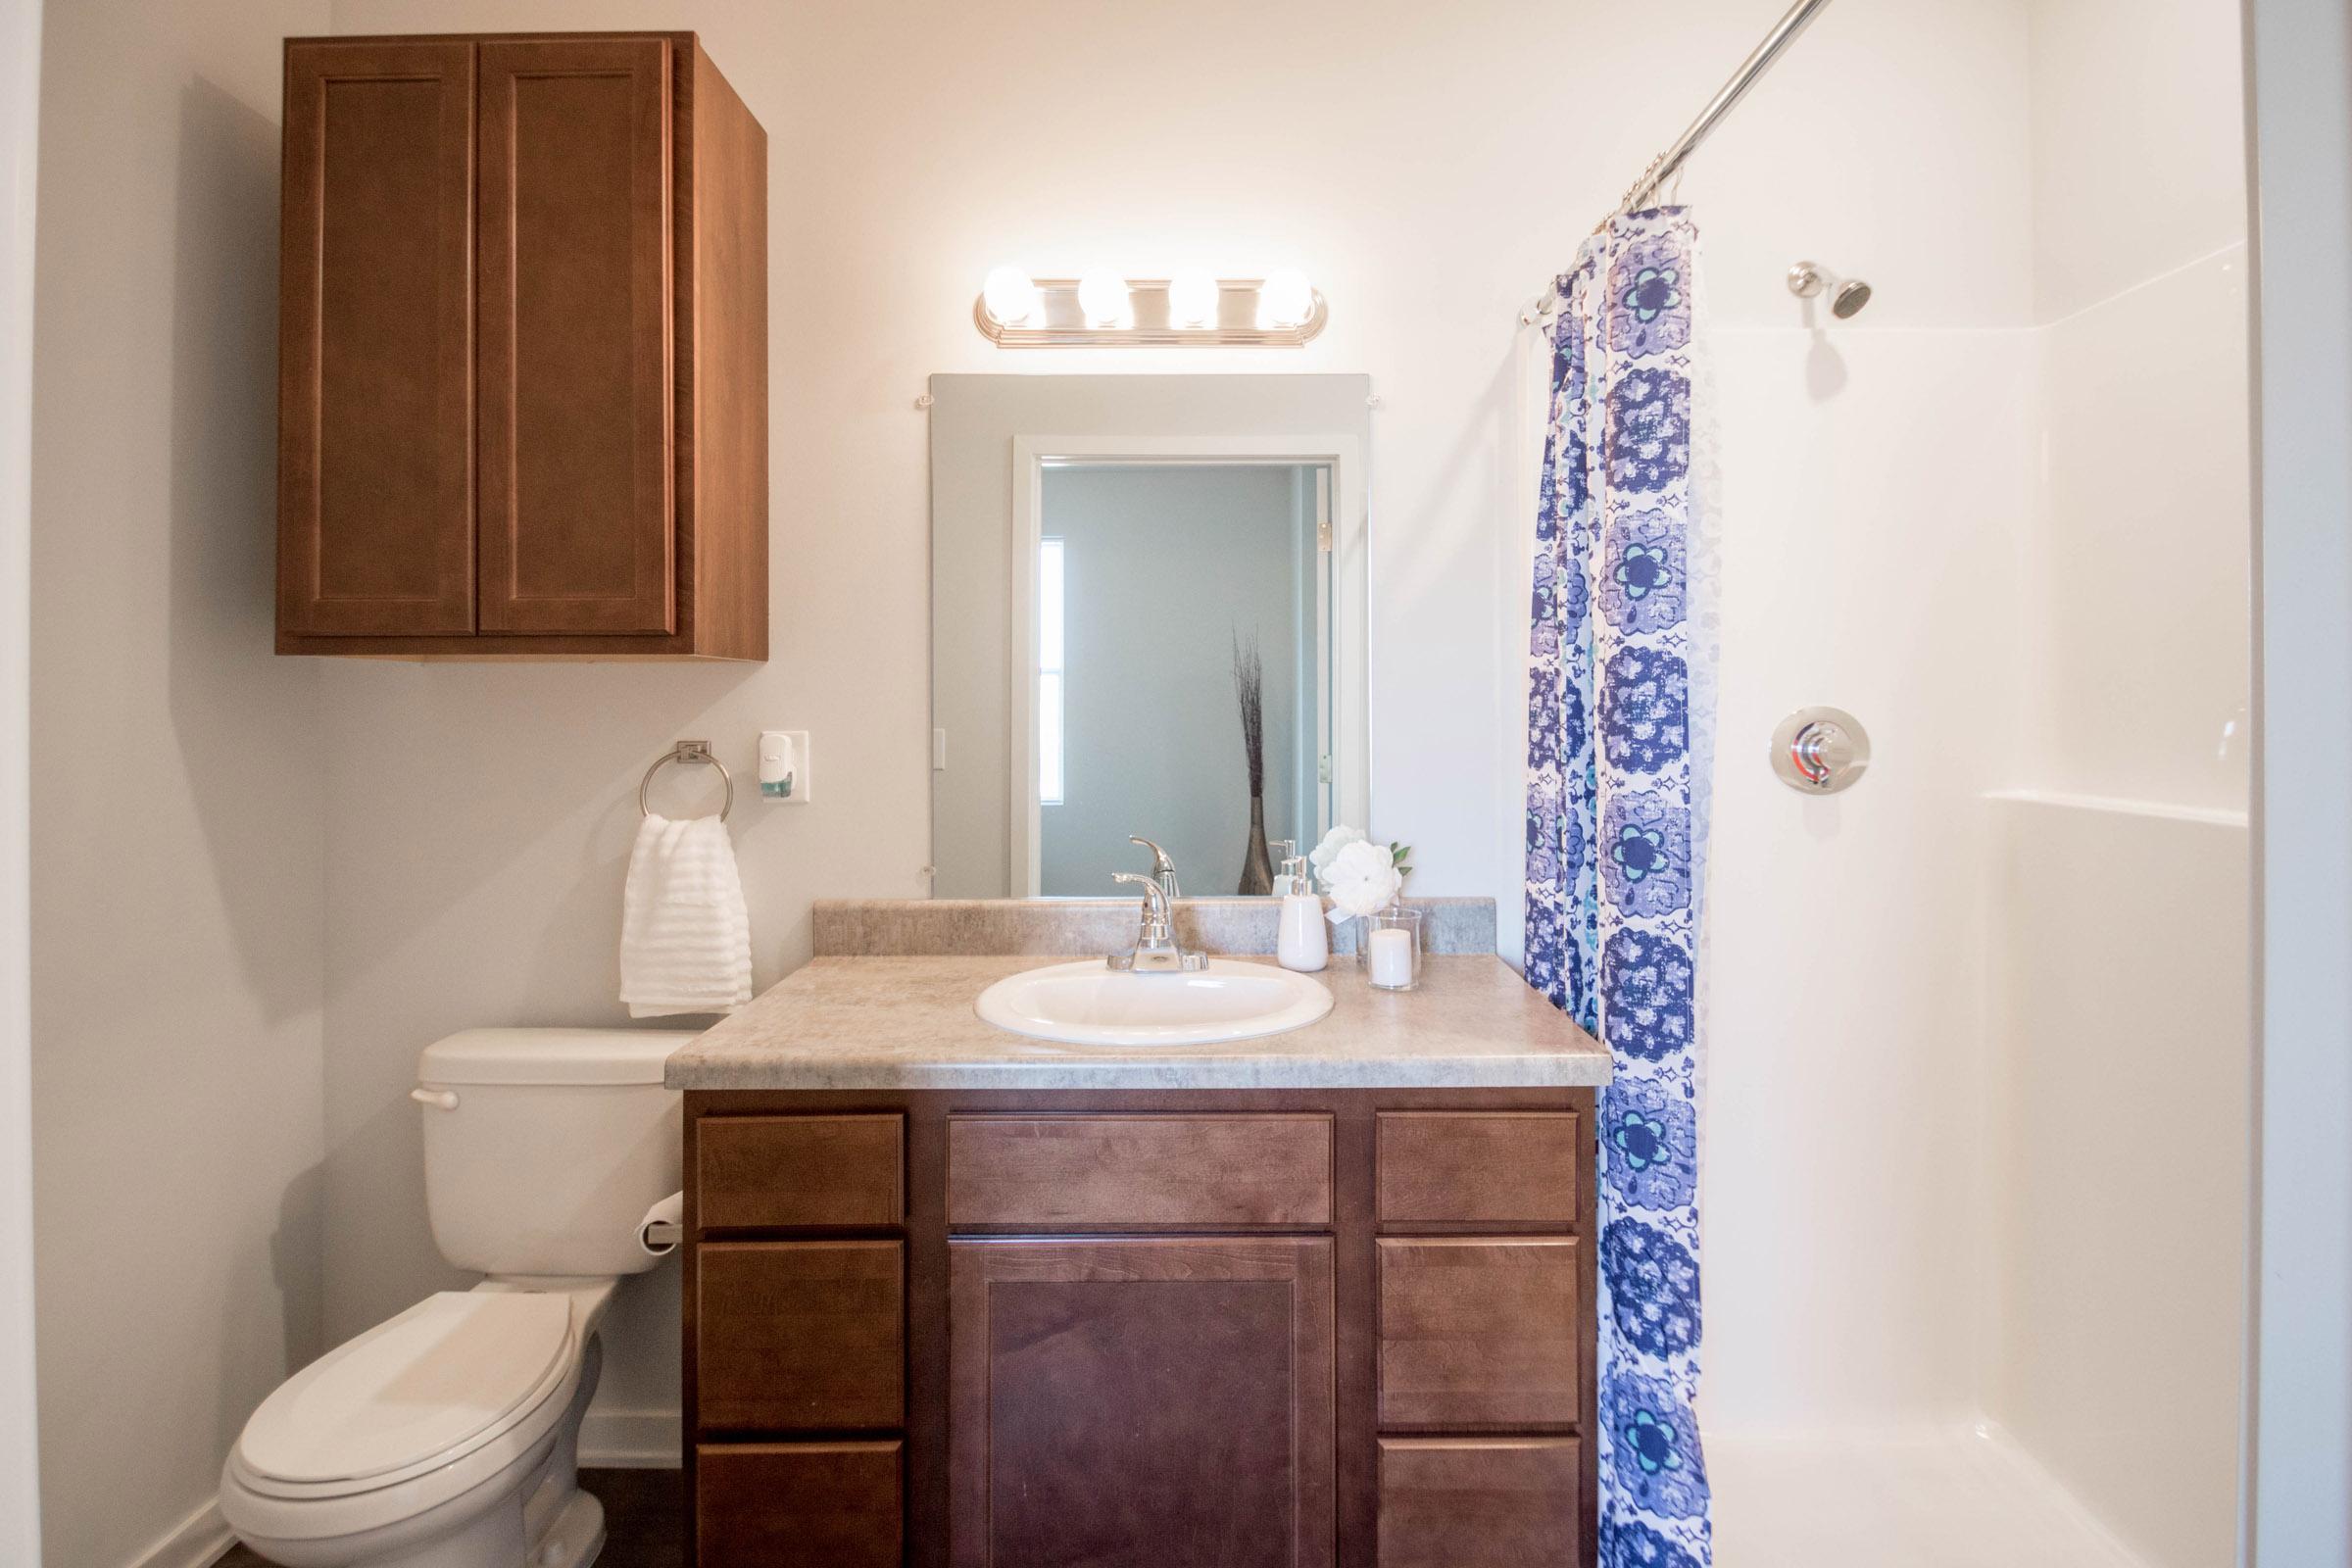 Single Vanity at Aspen Grove Apartments in Omaha, NE